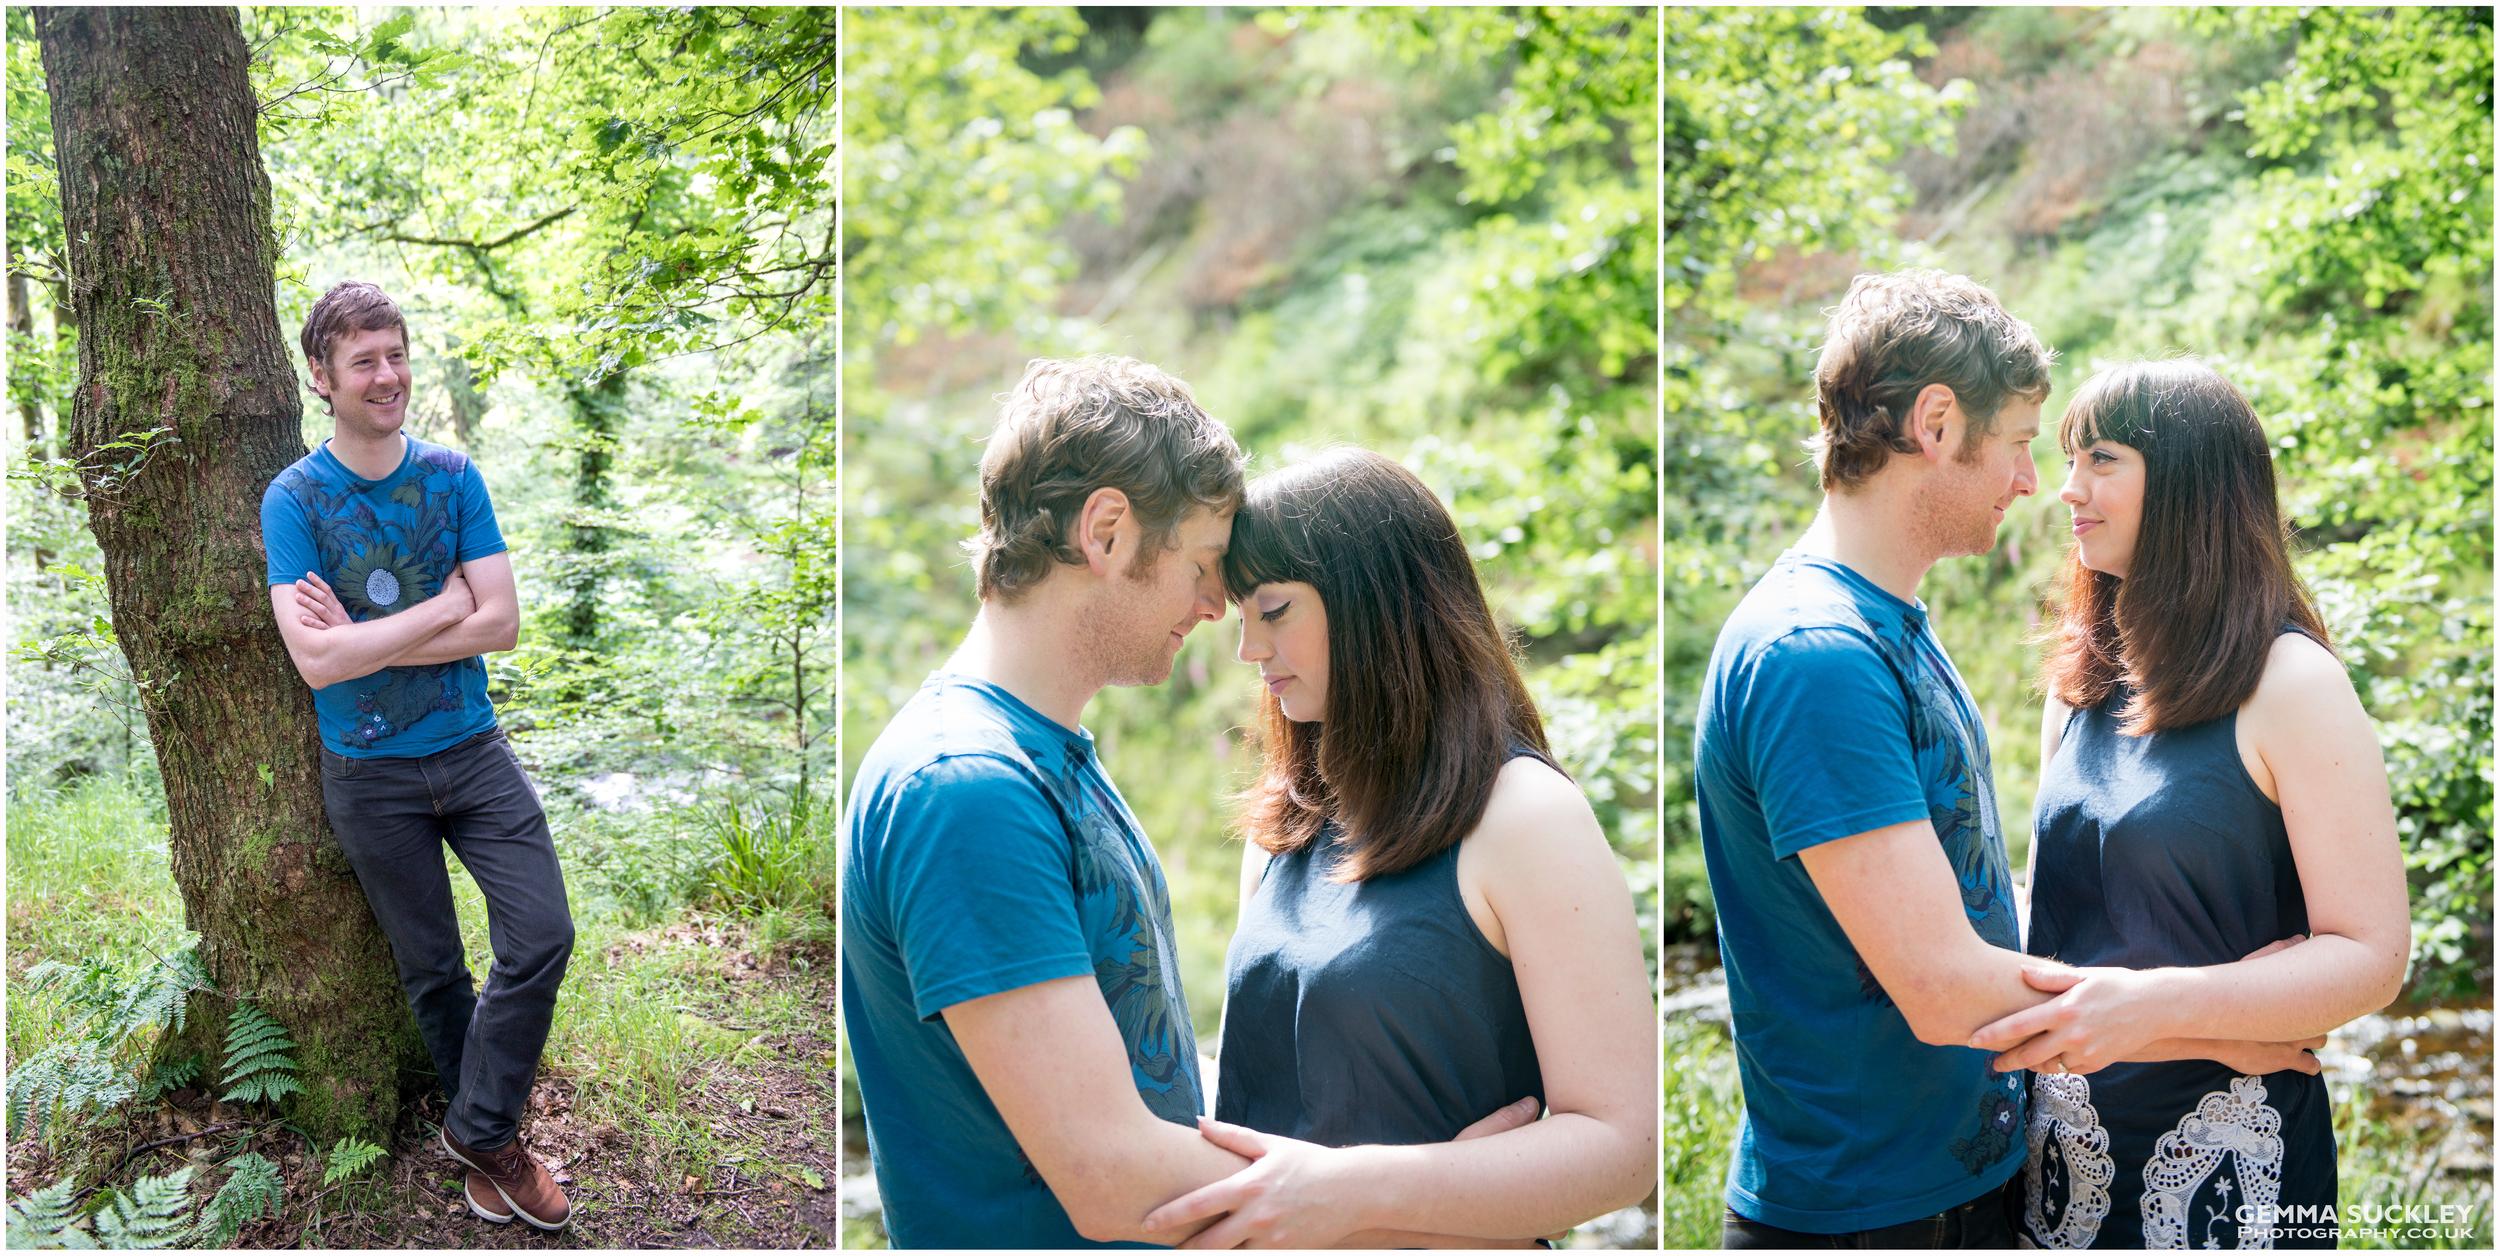 hardcastle-crag-yorkshire-wedding-photography.jpg